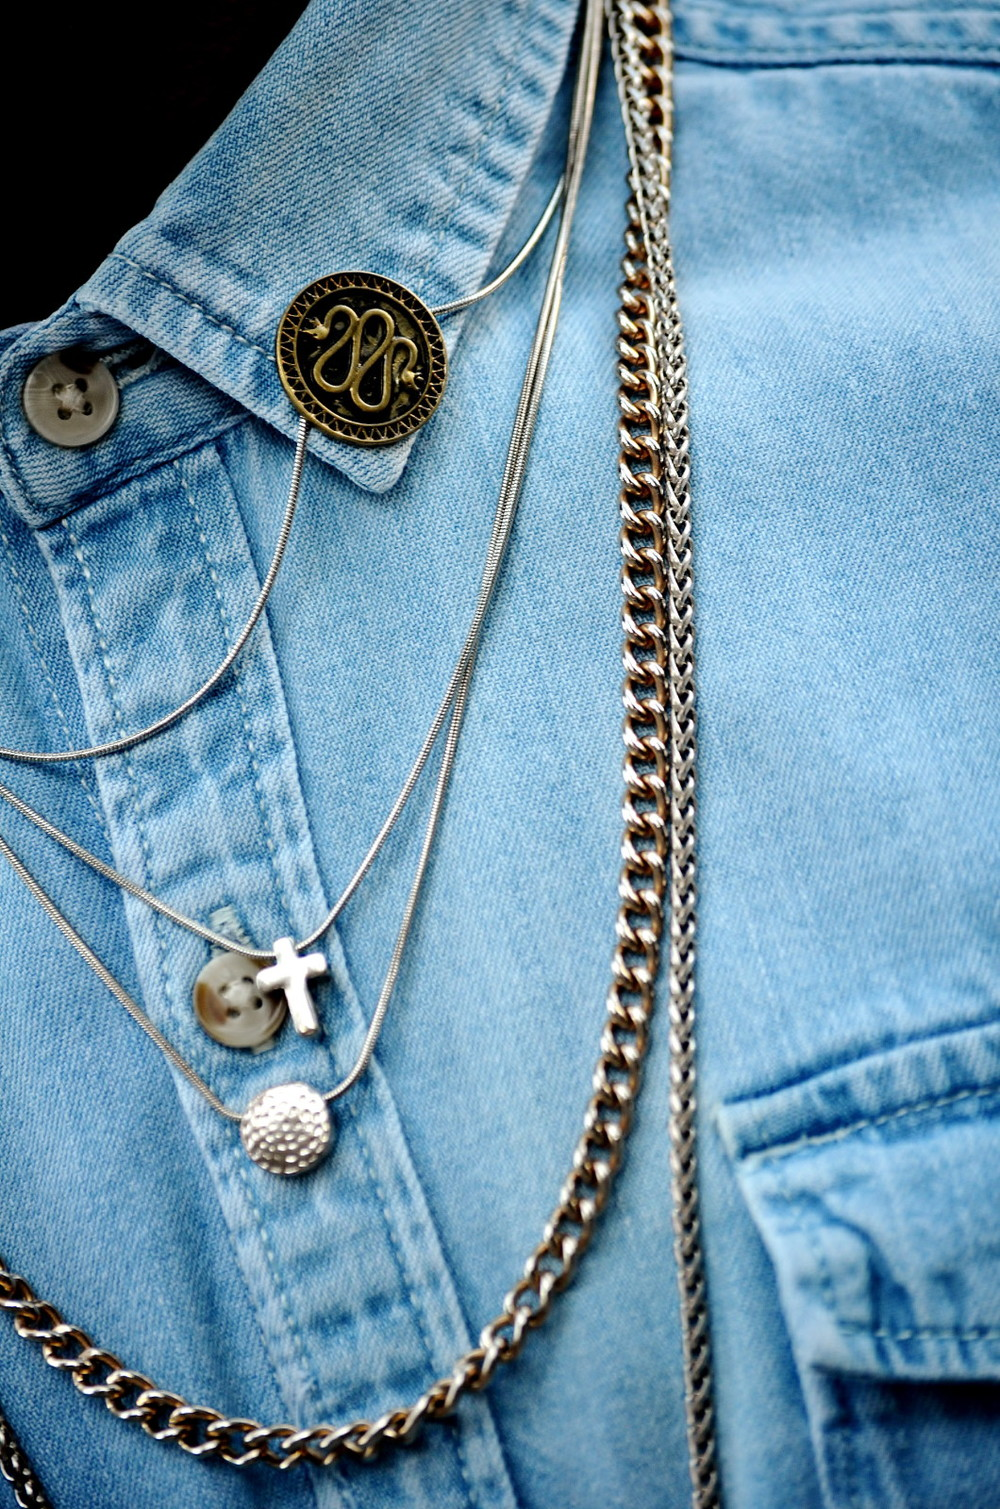 Collar Tip: Topman